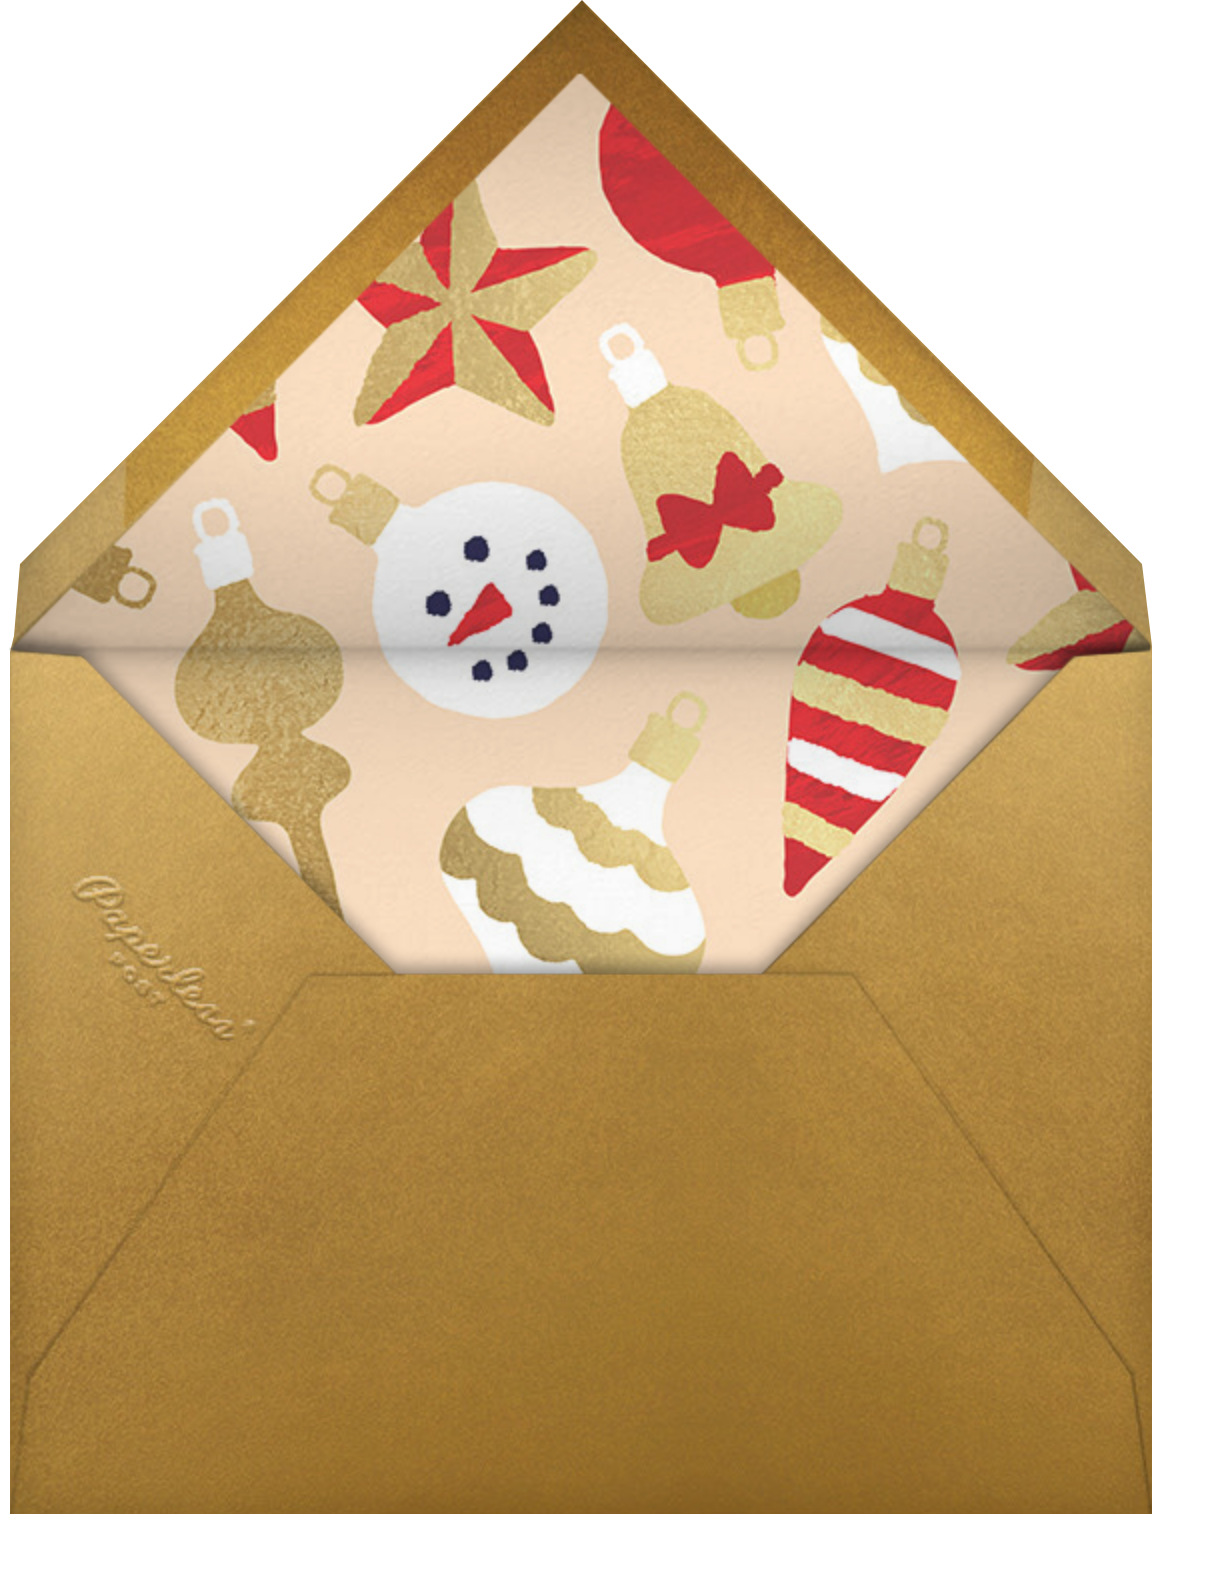 Home Screen (4 Photos) - Bellini - Paperless Post - Envelope